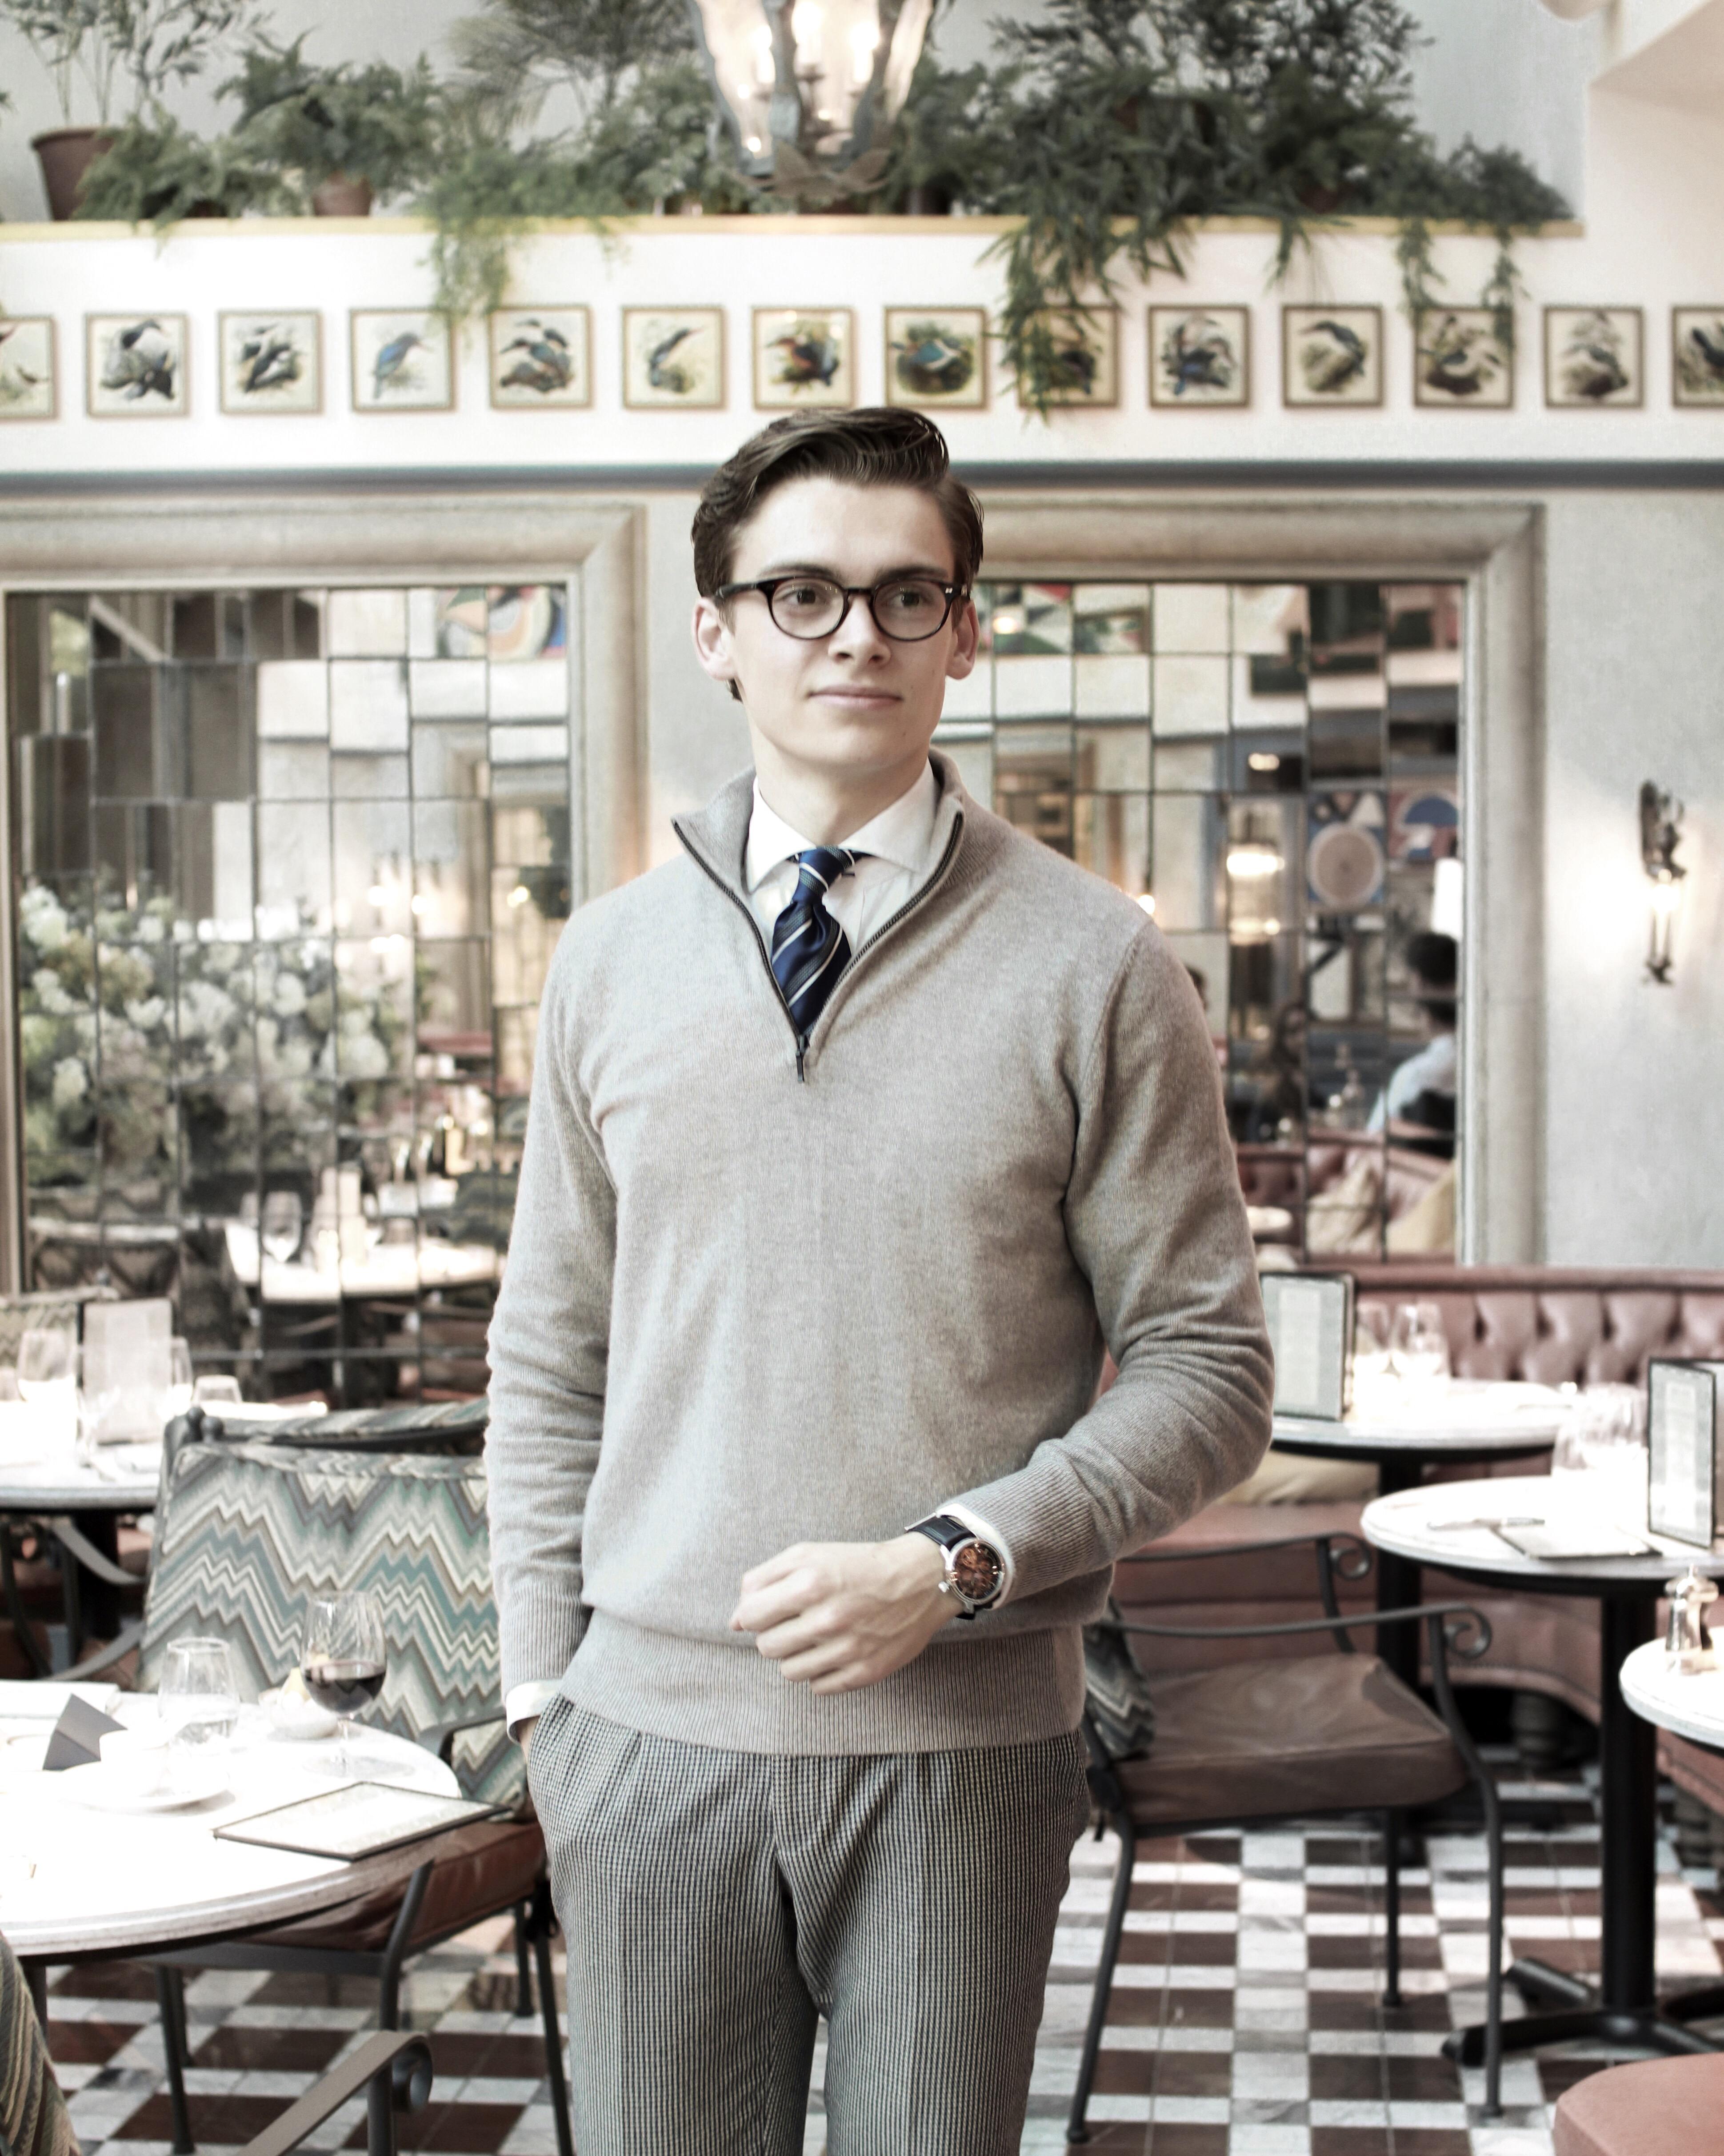 the ivy tower bridge london restaurant luxury gentleman blogger tie smart casual